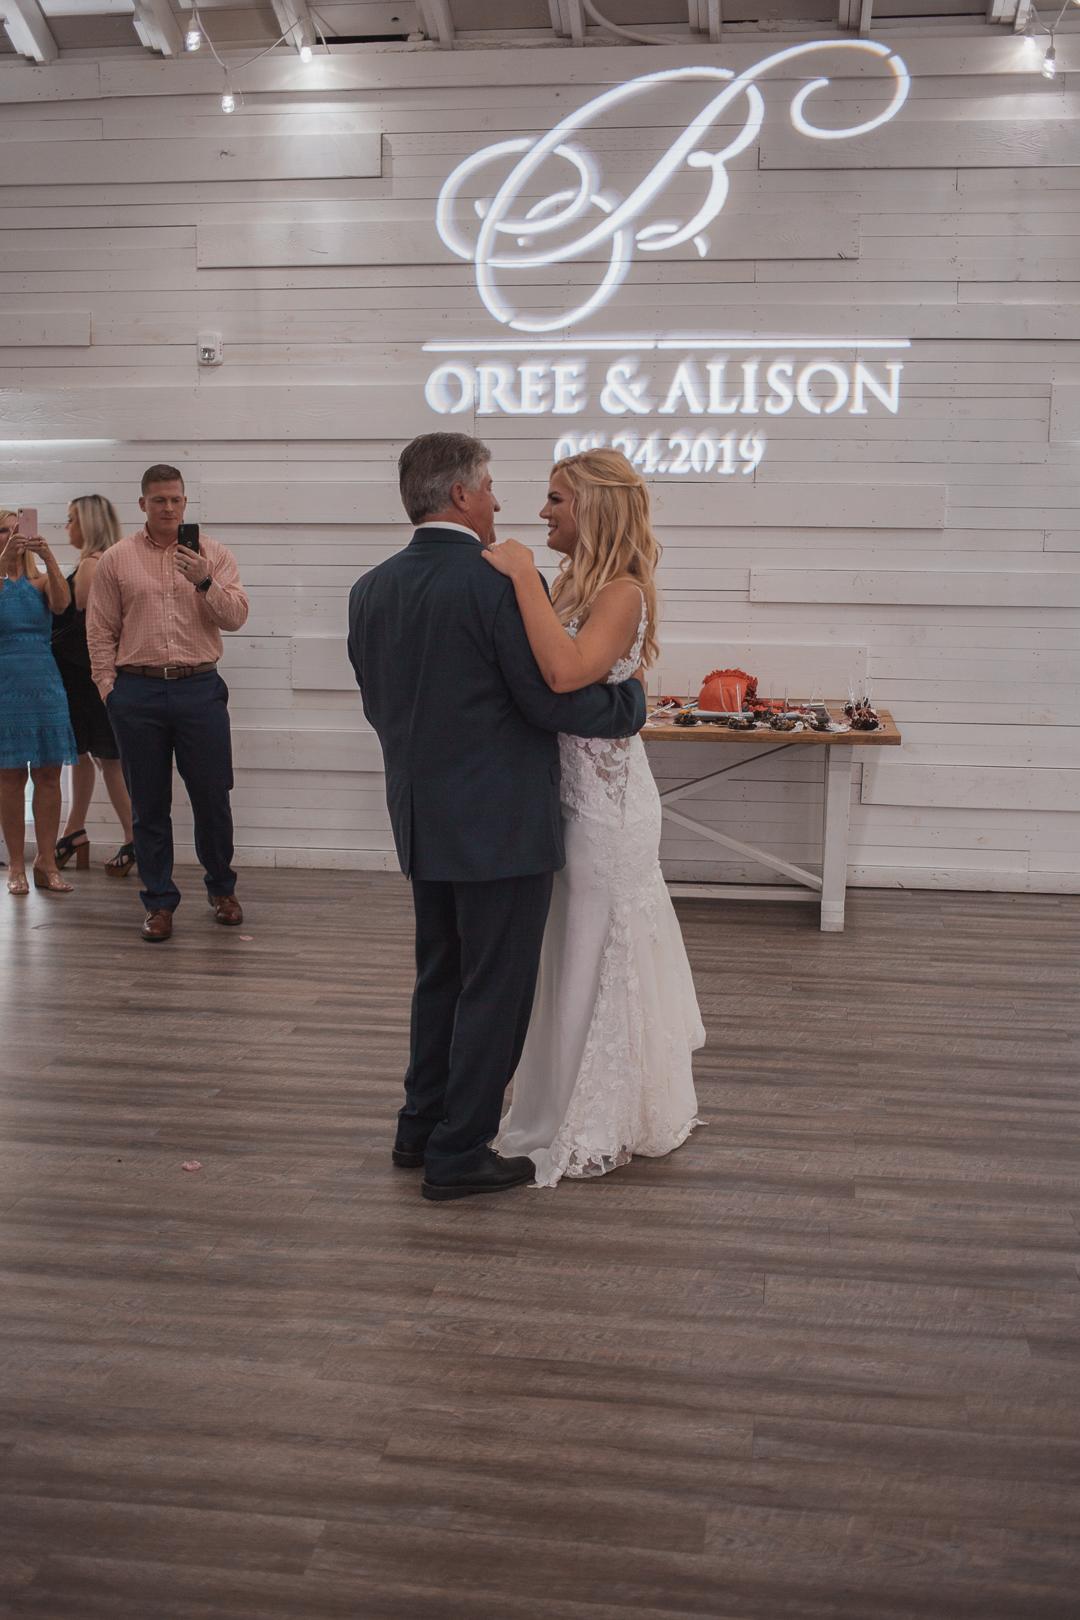 Aloson & Oree's Wedding (8-24-19) Edited5926.jpg